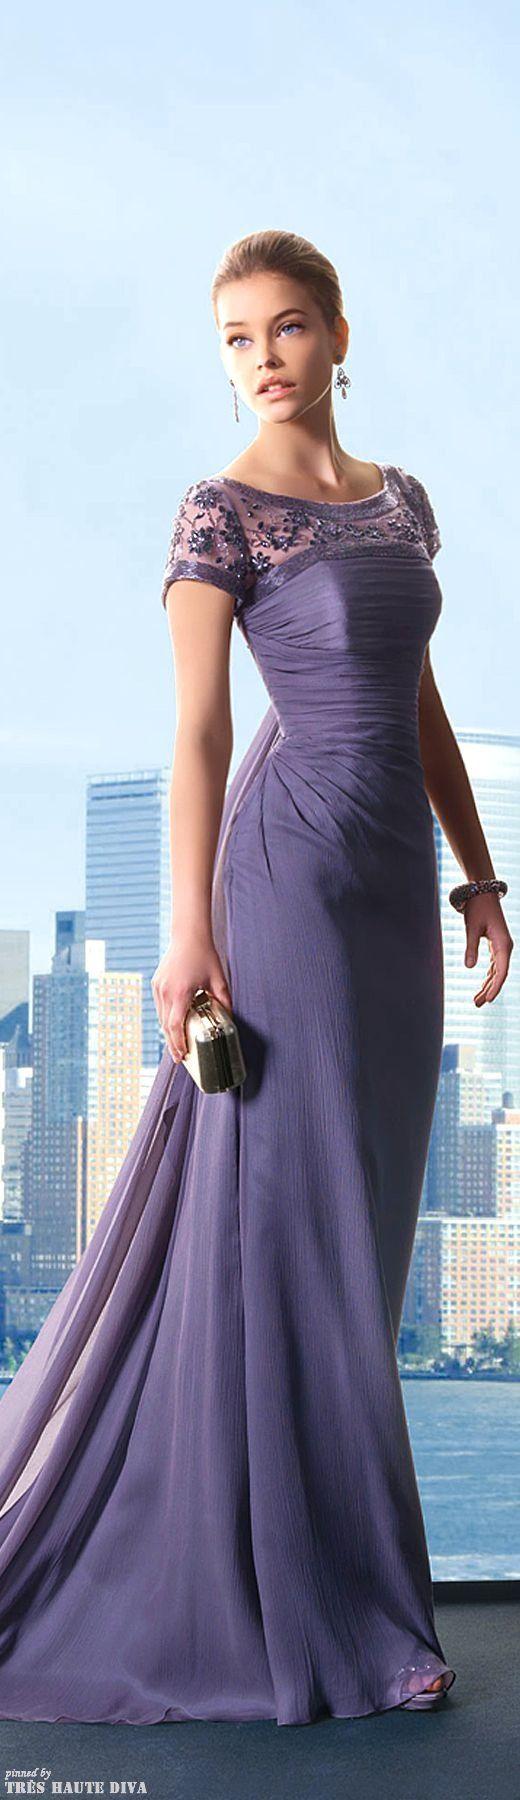 105 best Mis damas images on Pinterest | Wedding souvenir, Wedding ...